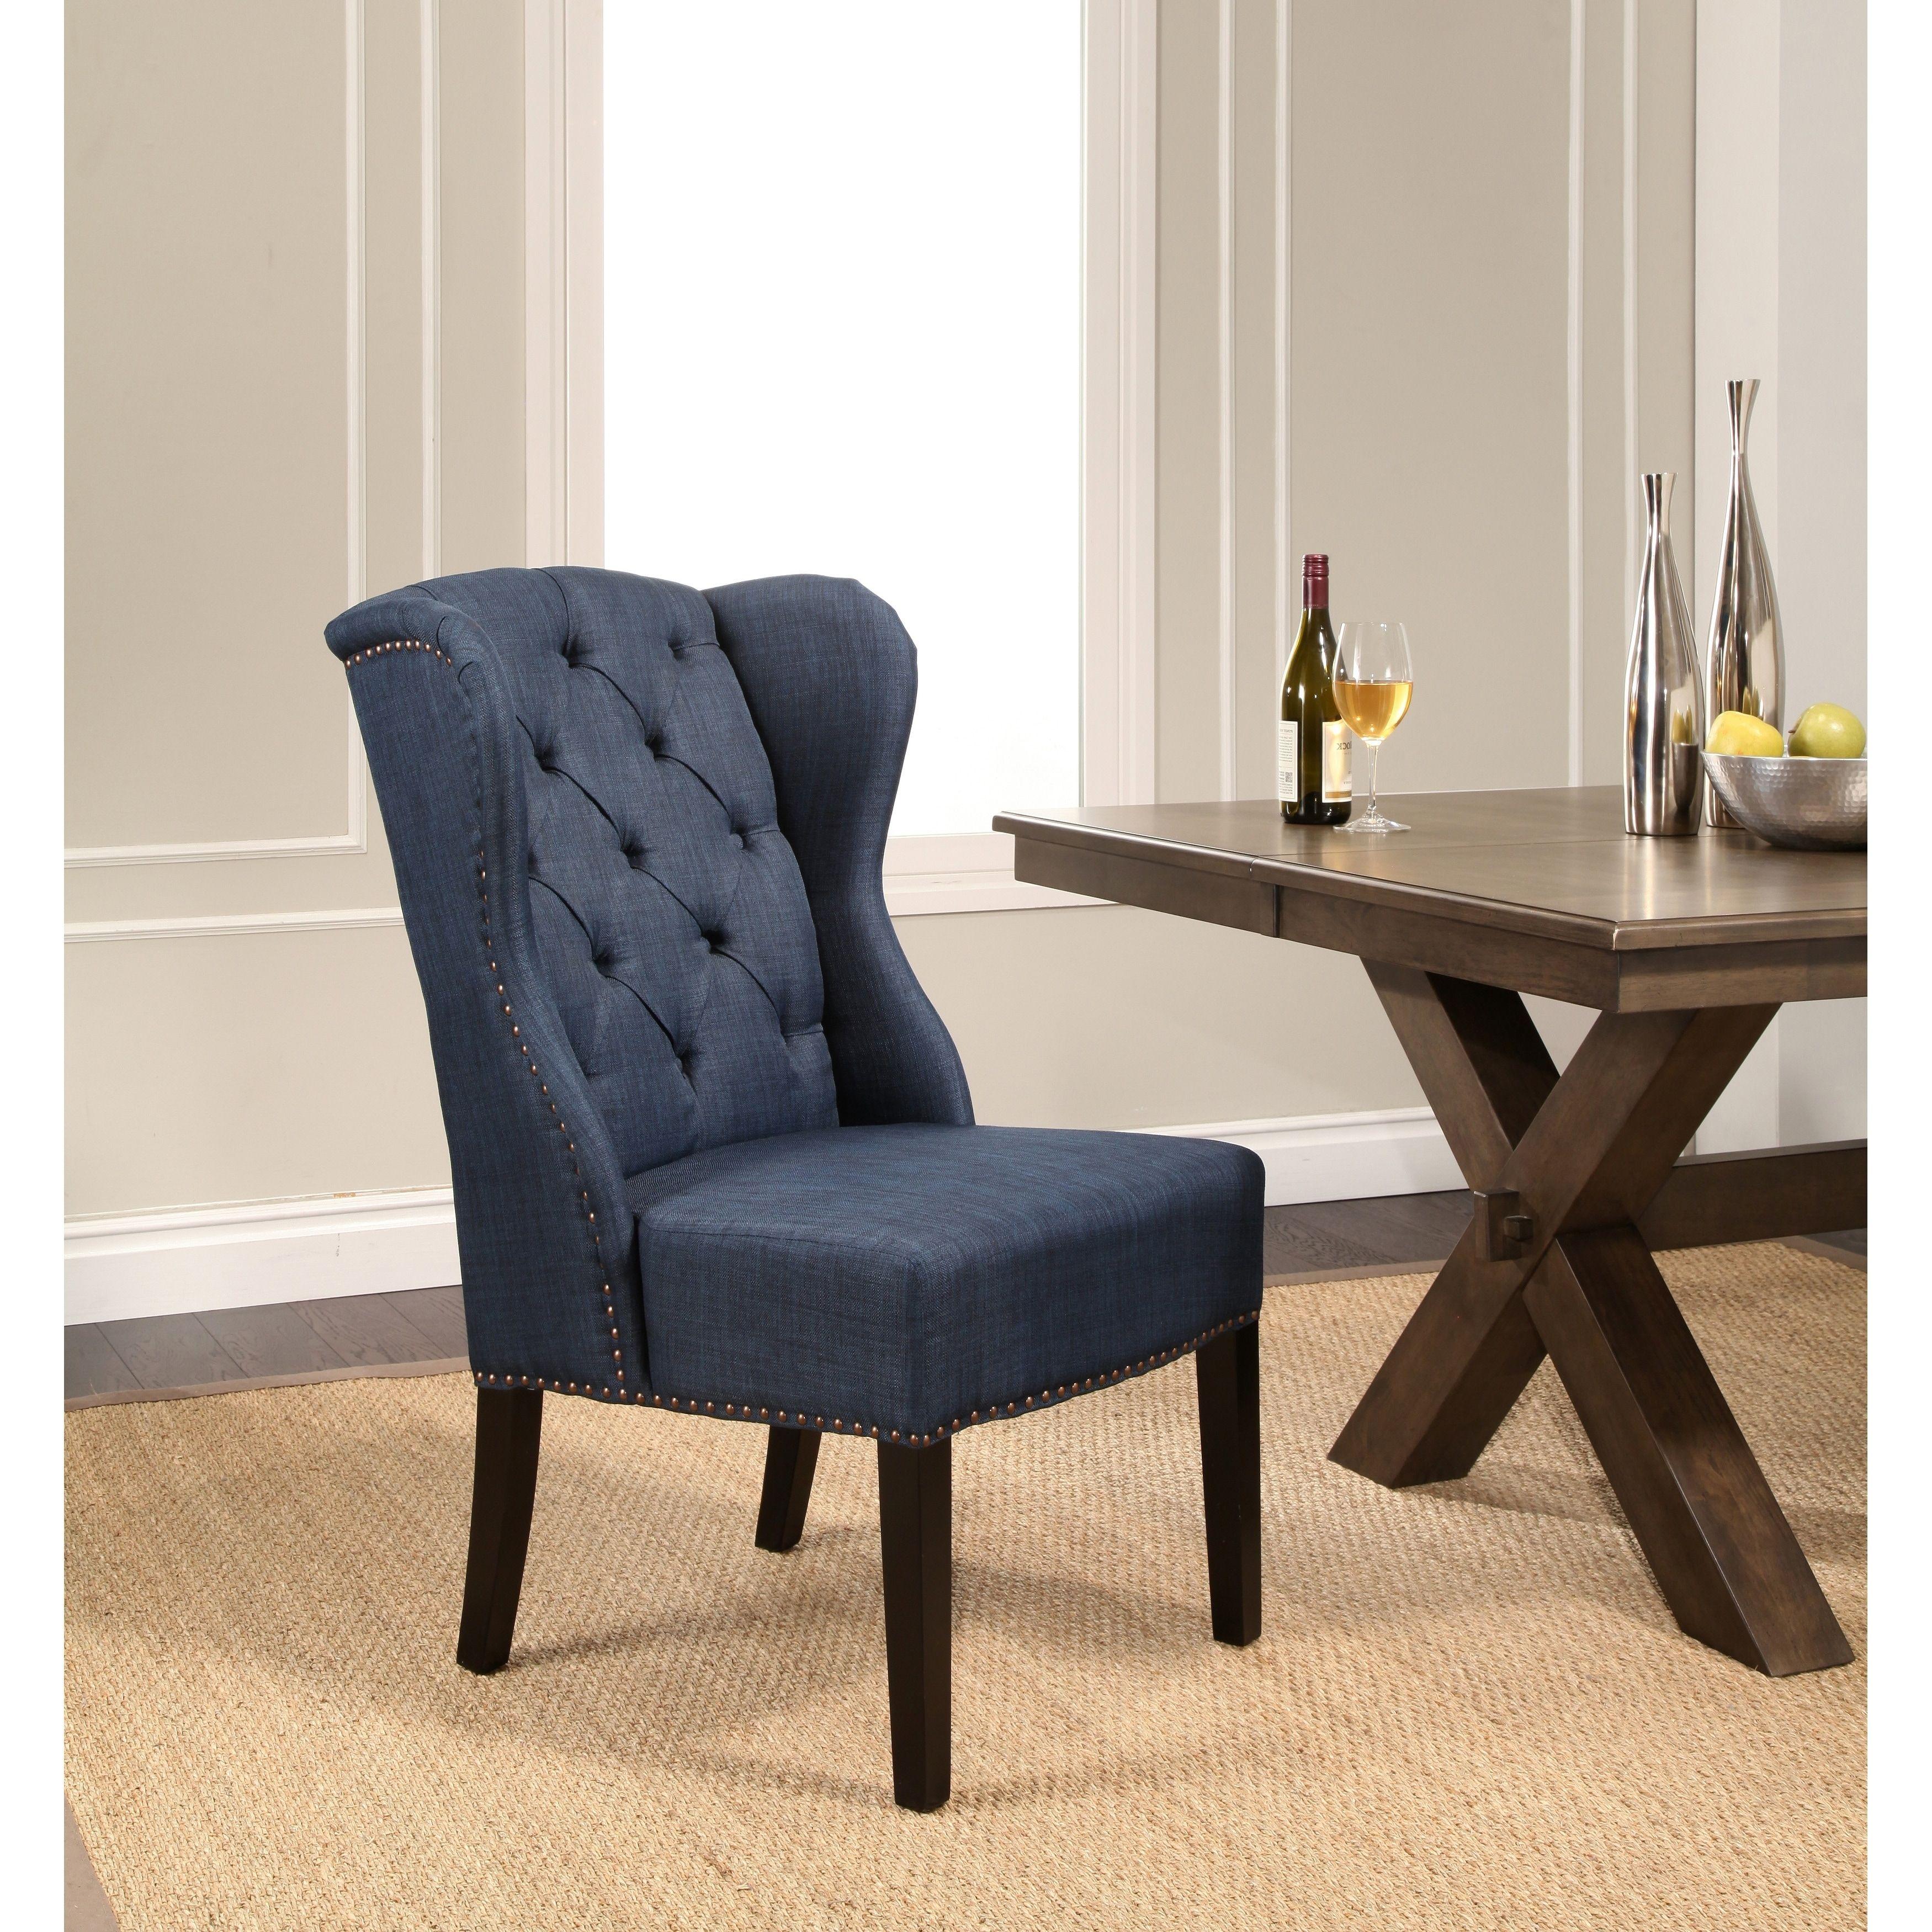 Abbyson Sierra Tufted Fabric Wingback Dining Chair Grey